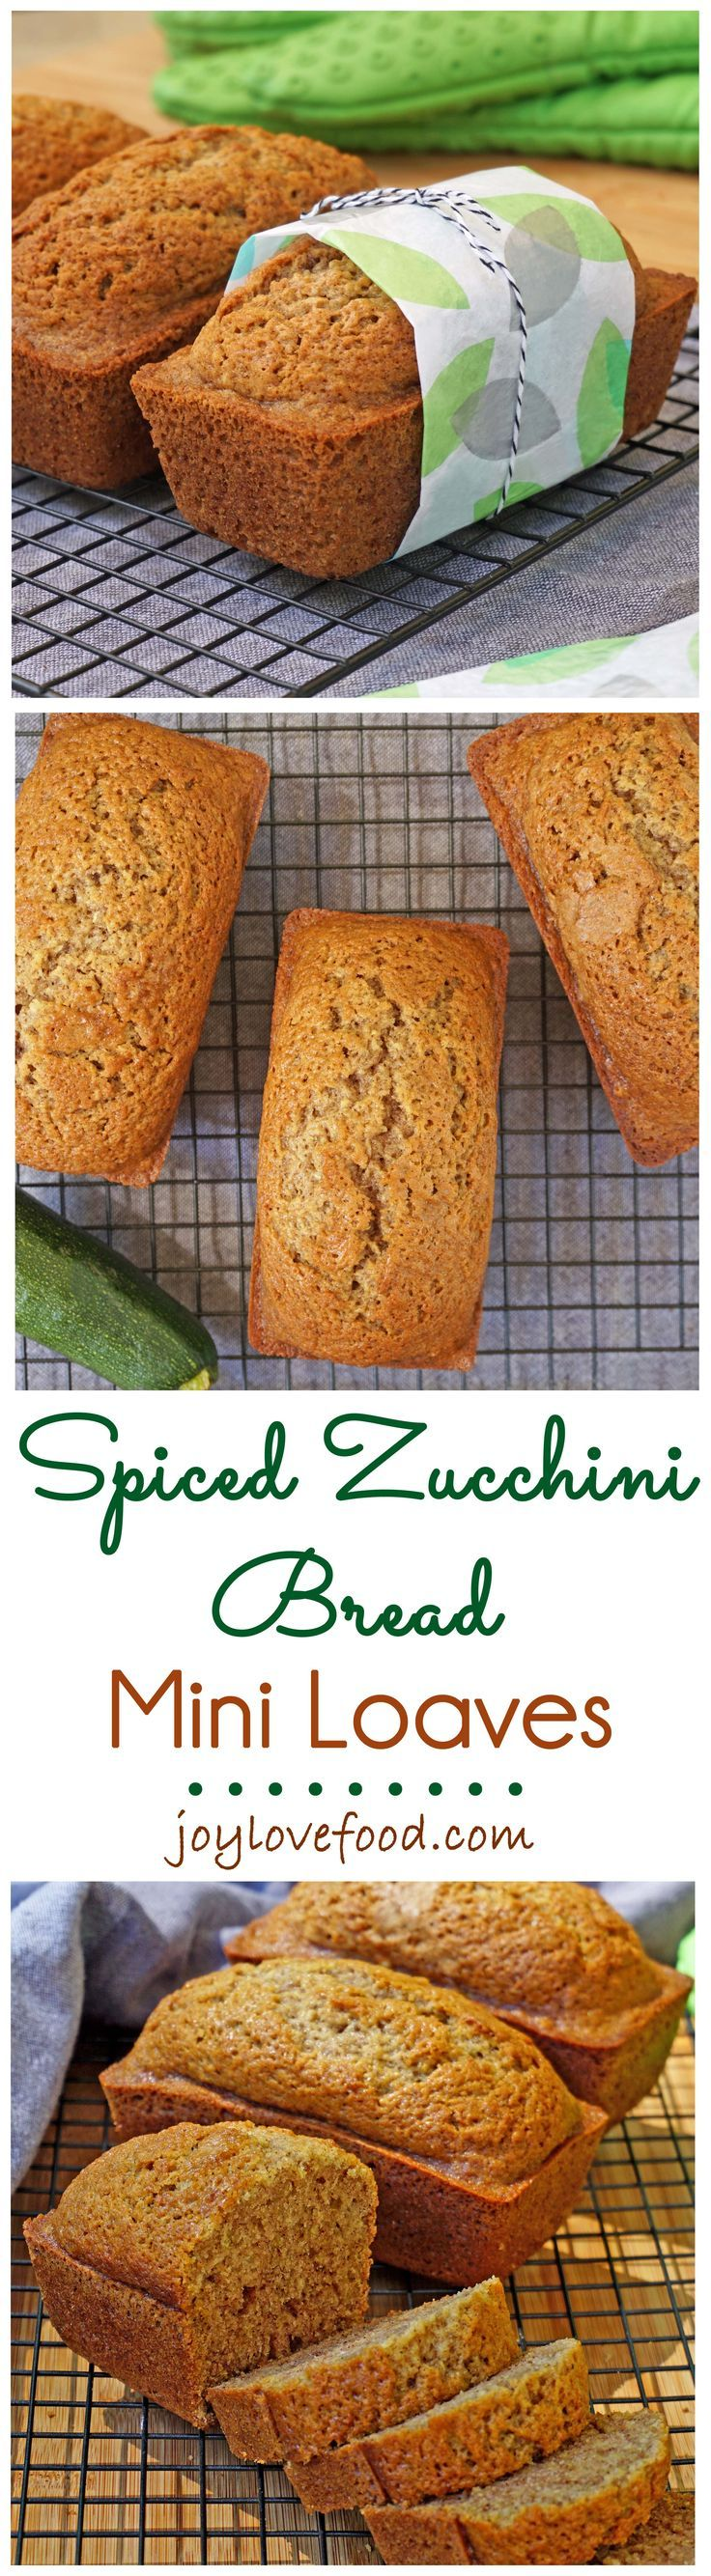 Spiced Zucchini Bread Mini Loaves: